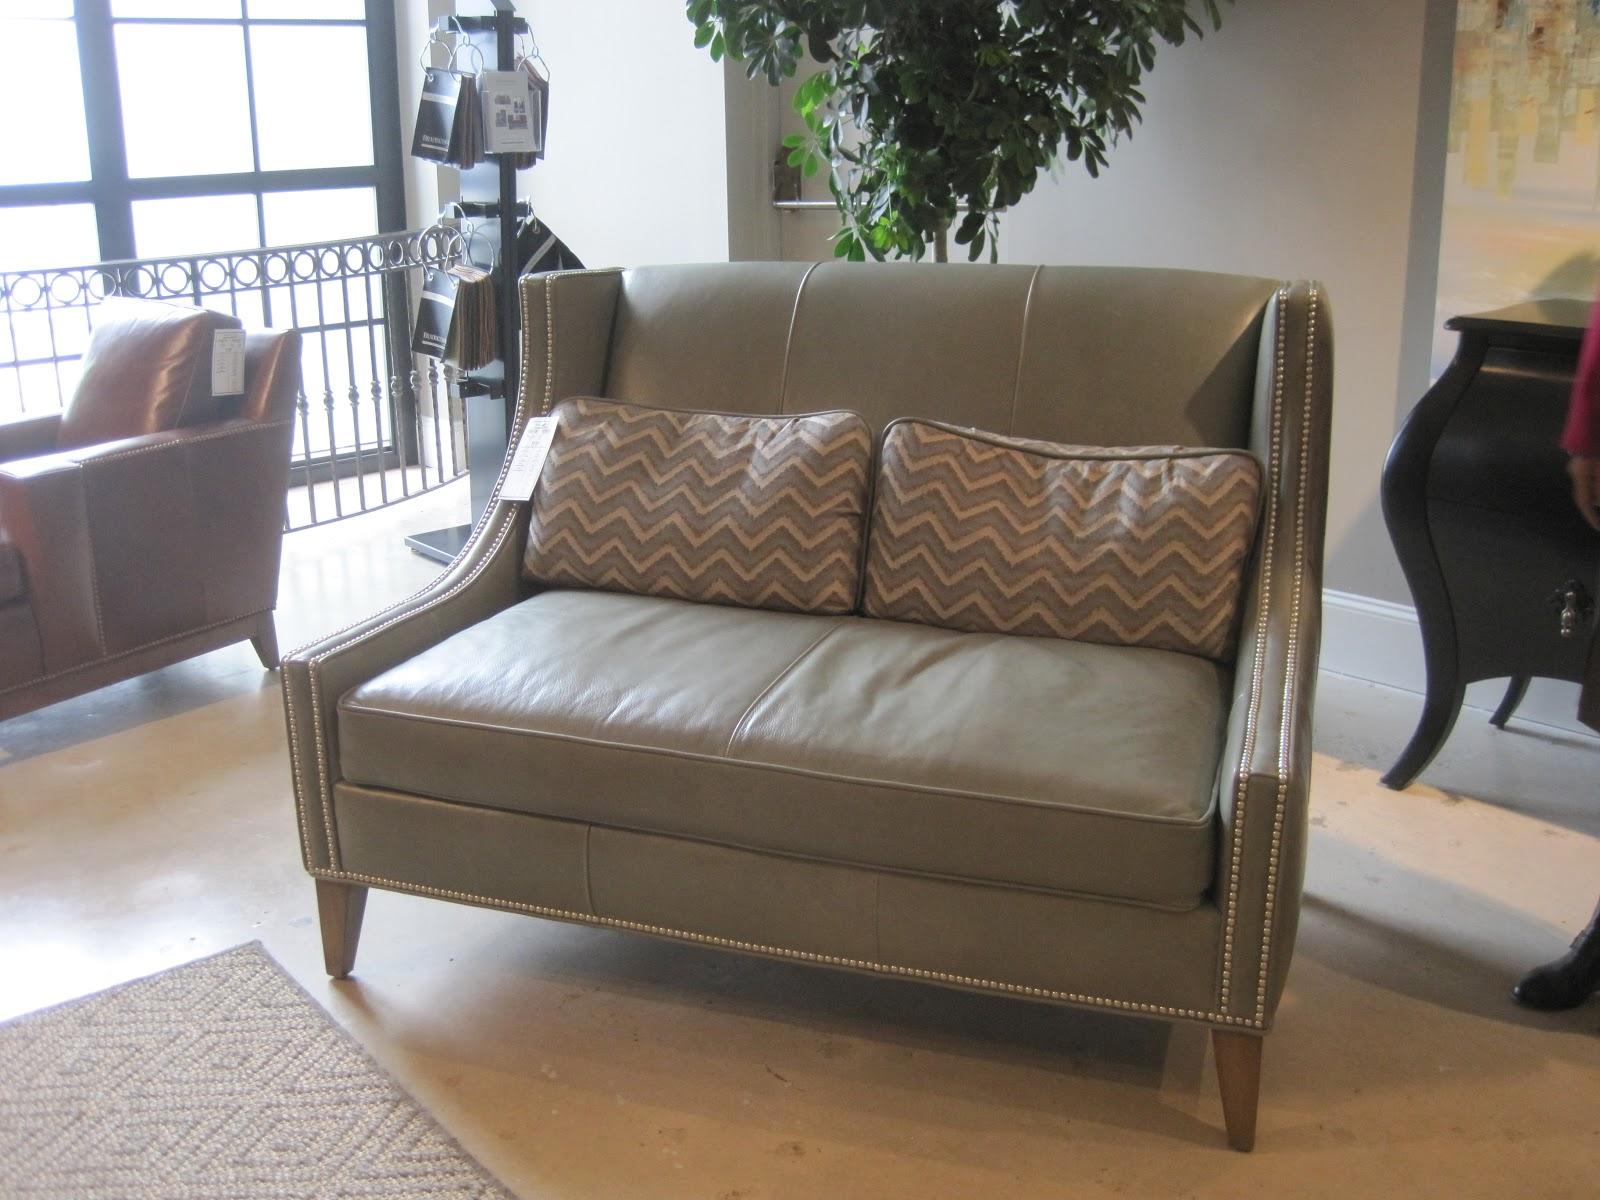 Architect Design Highpoint Fall 2012 Hooker Furniture